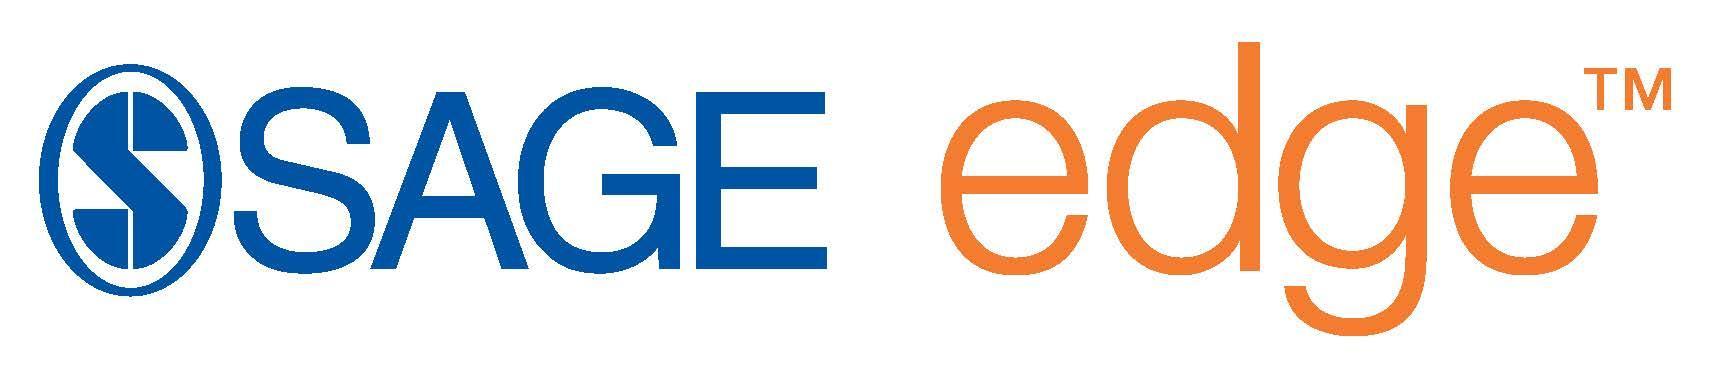 SAGE edge logo